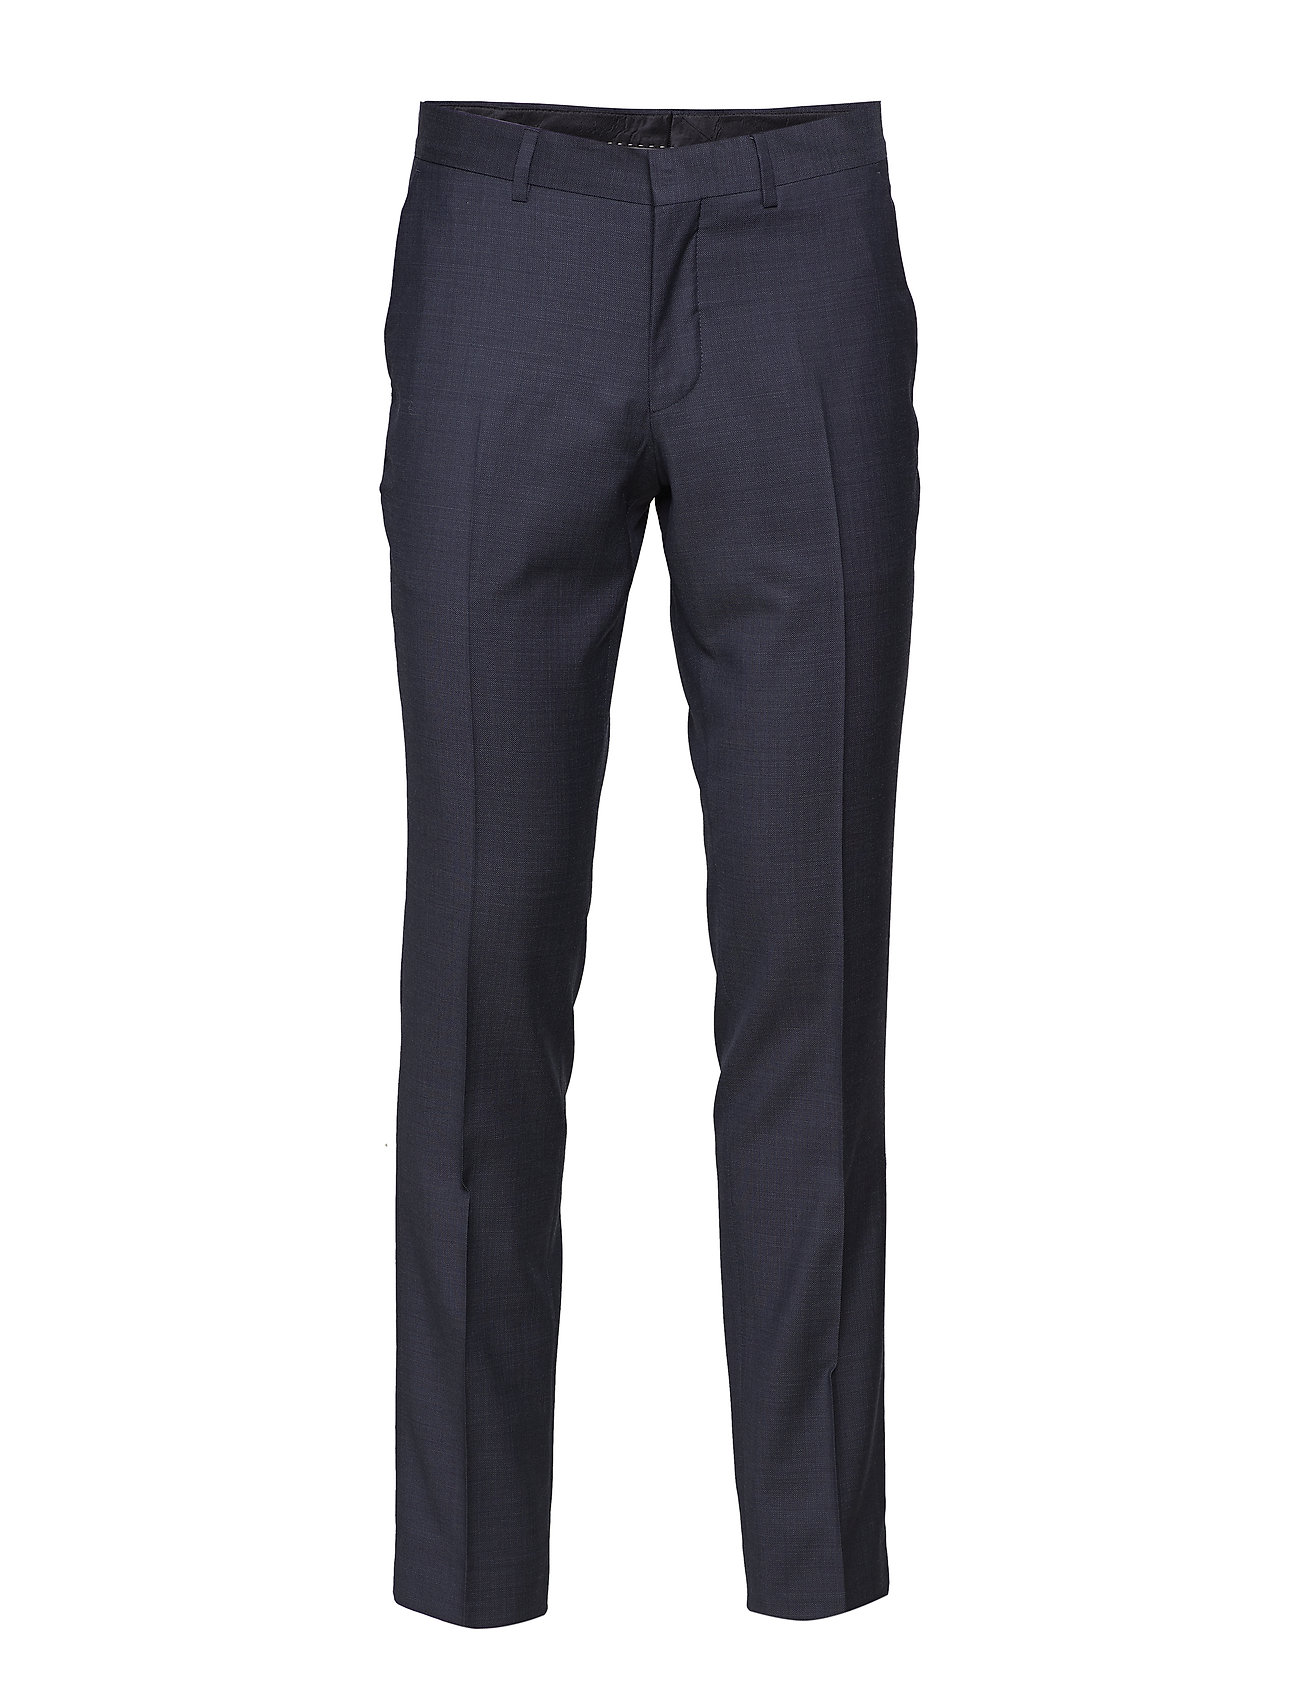 Lindbergh Super 120s pants - NAVY